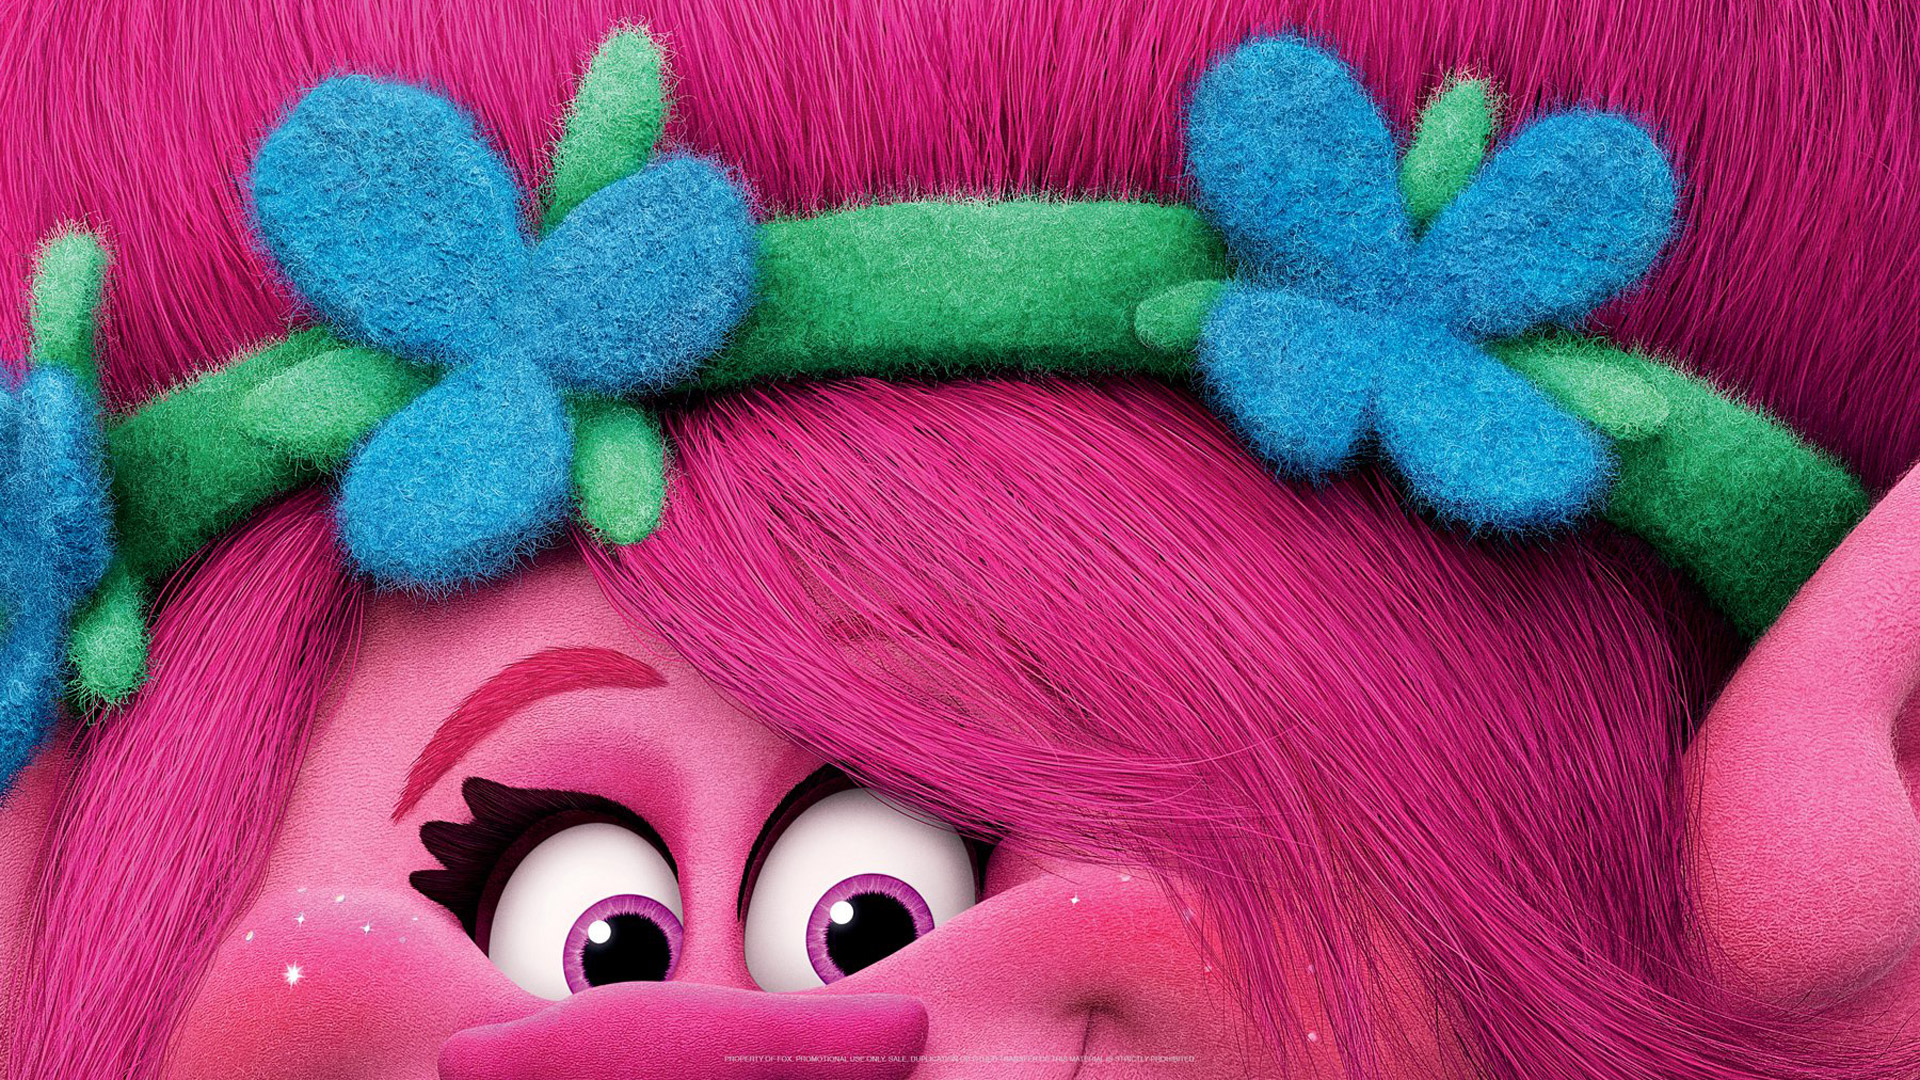 2048x1152 Poppy Trolls 2048x1152 Resolution Hd 4k HD Wallpapers Download Free Images Wallpaper [1000image.com]